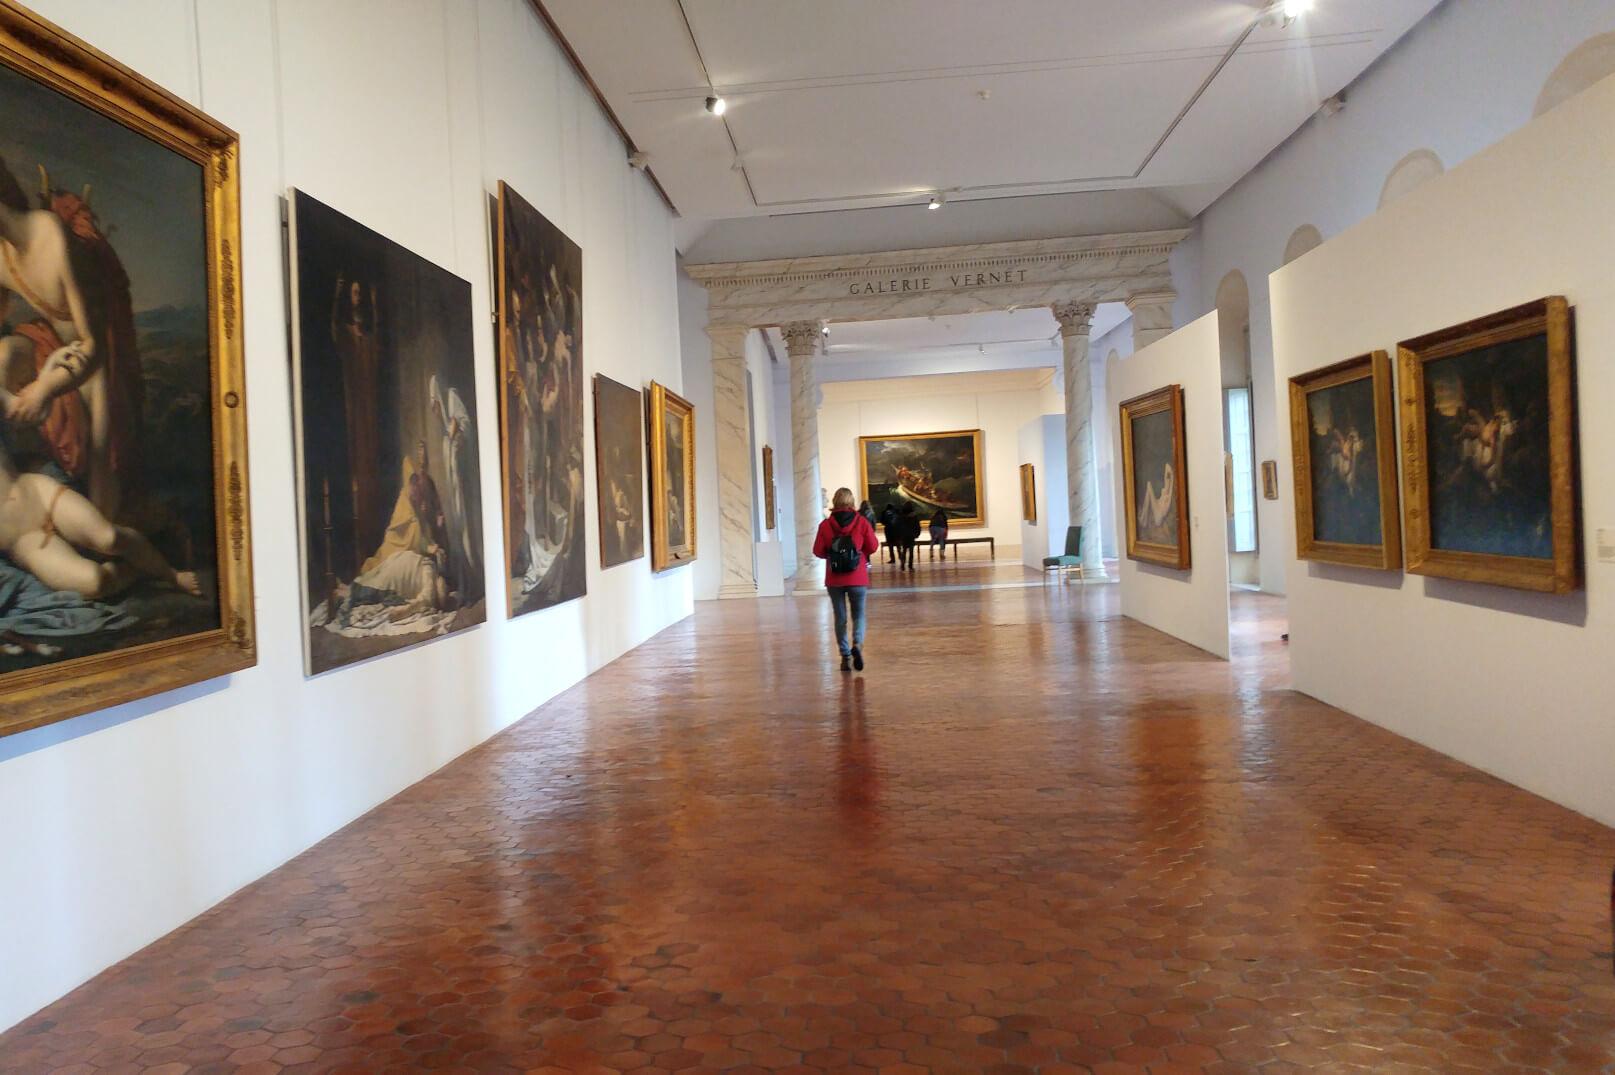 Avignon de musée en musée